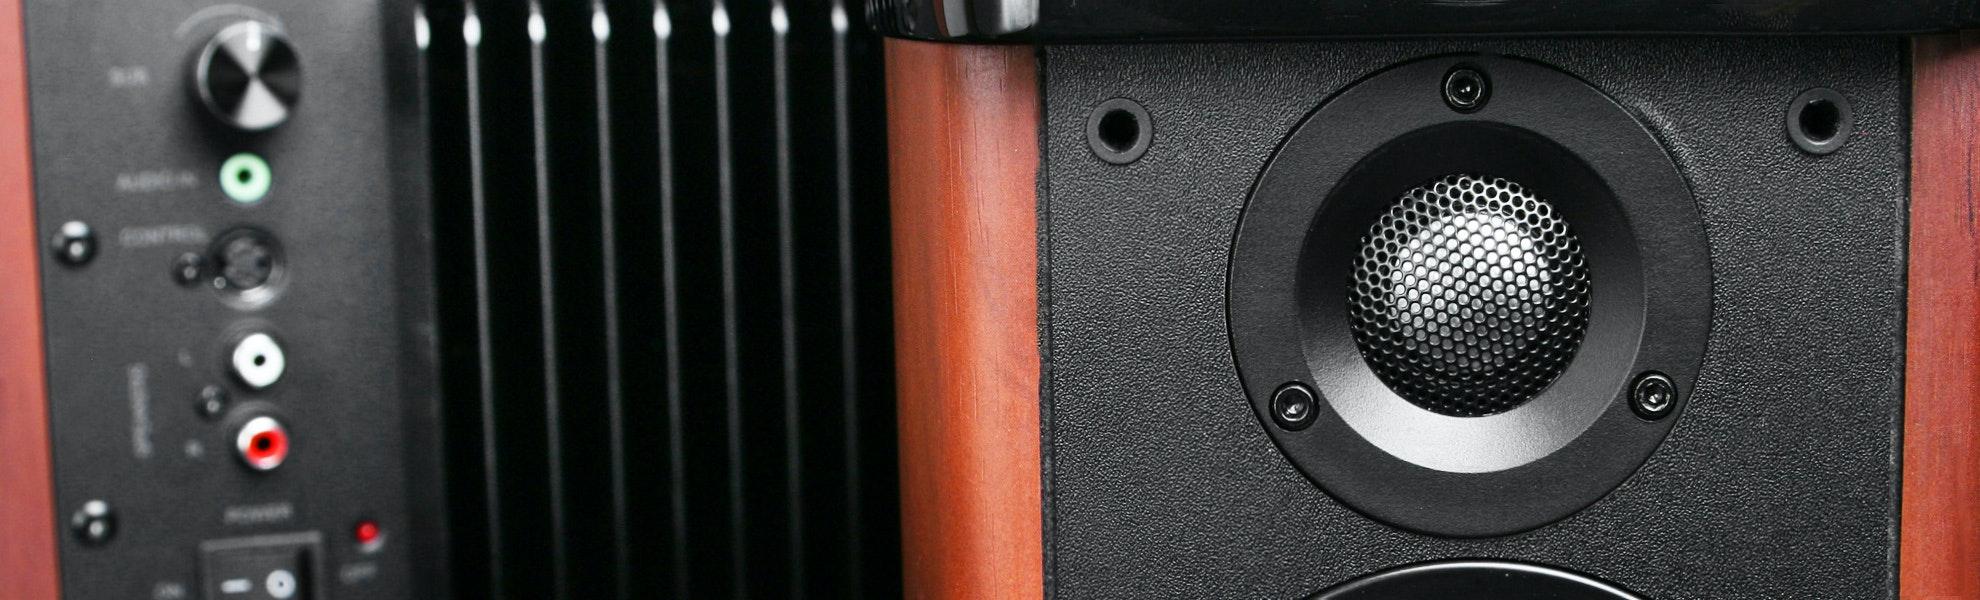 HiVi M50W Multimedia Speaker System